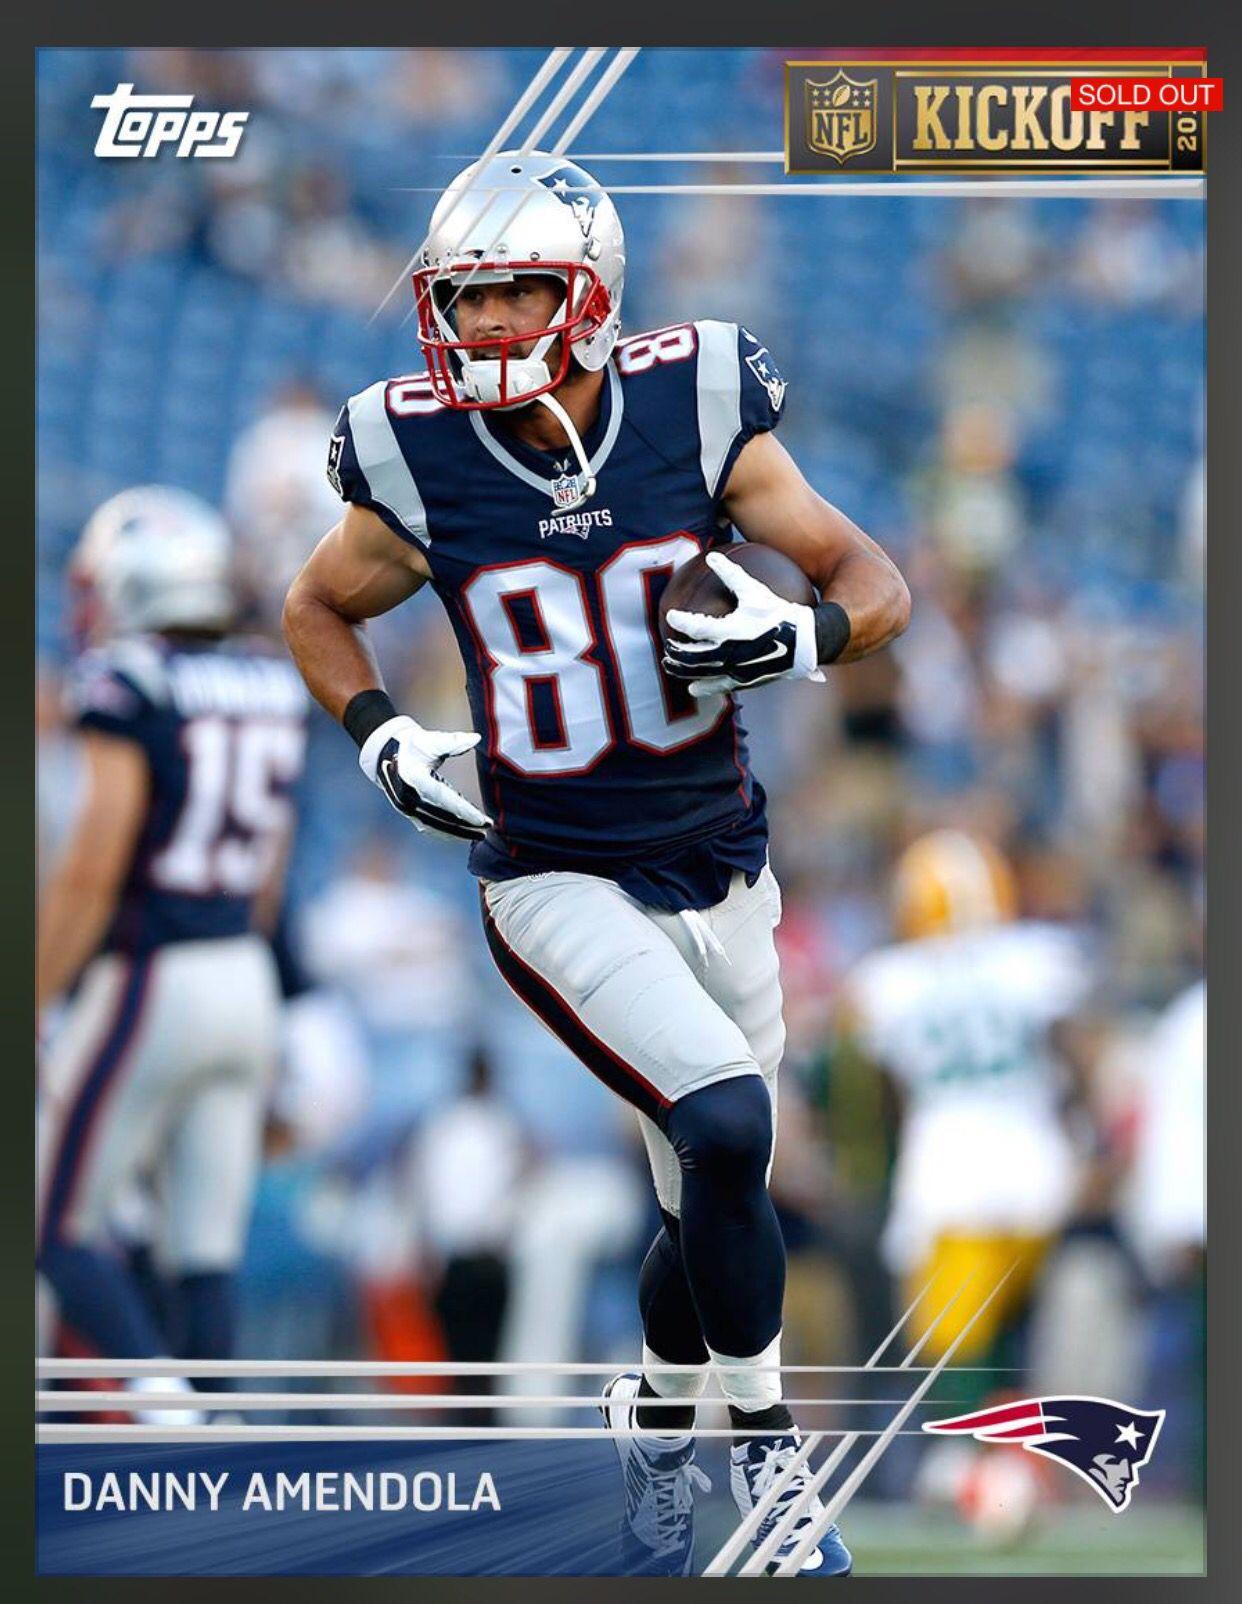 Danny Amendola New England Patriots Limited 2 500 Kickoff 2015 Insert Card 2016 Topps Huddle New England Patriots Danny Amendola Patriots